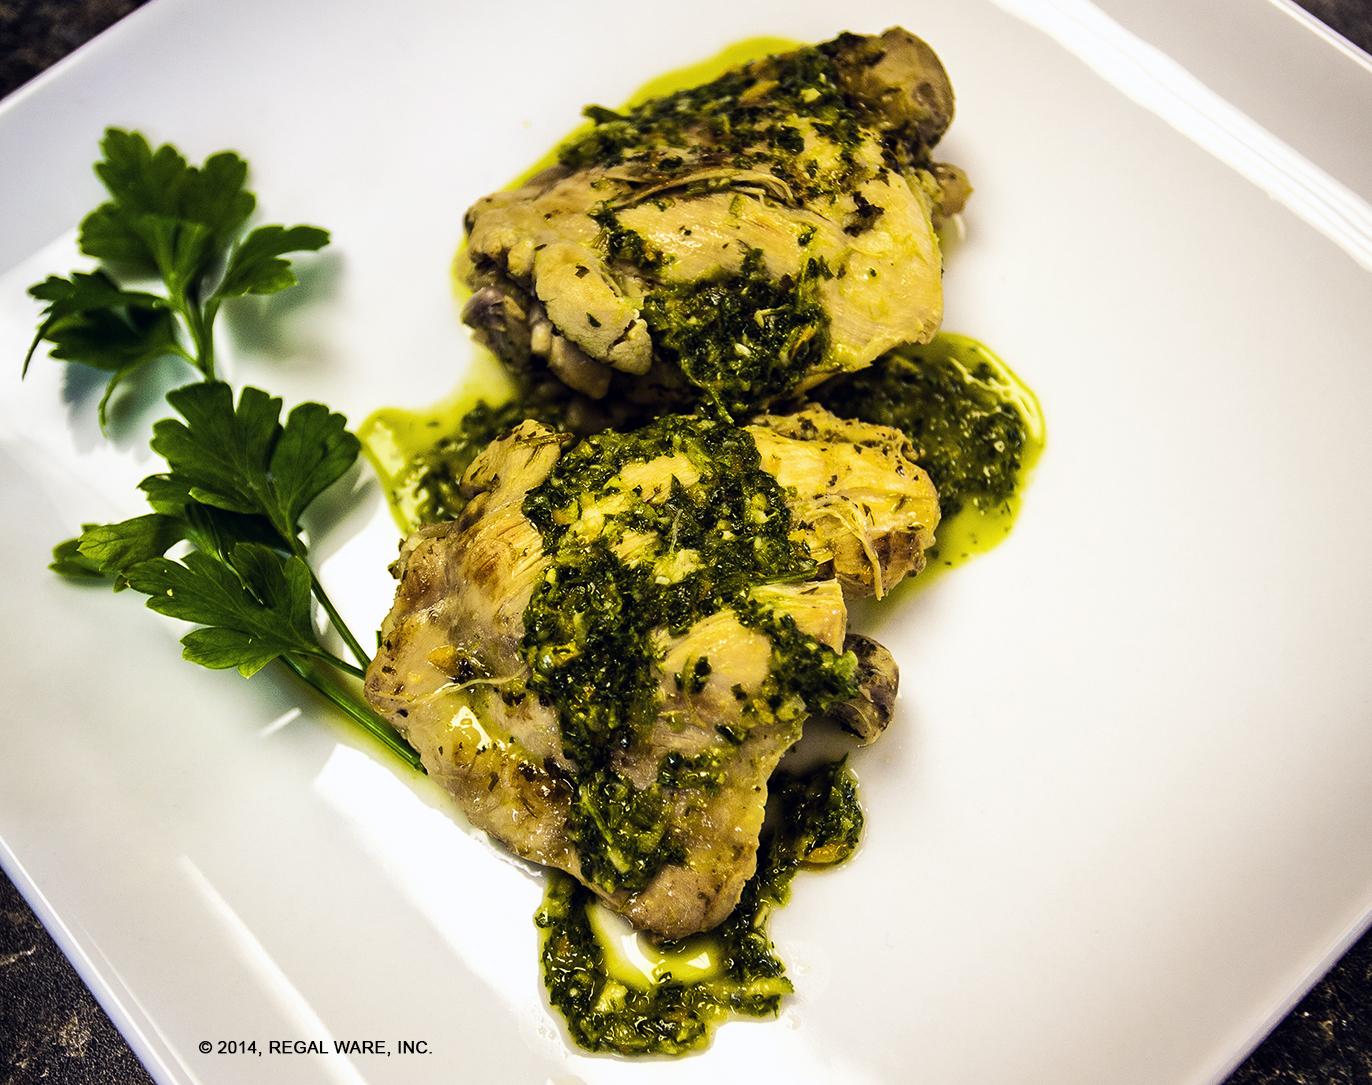 Food processor recipes saladmaster recipes citrus marinated chicken thighs forumfinder Gallery